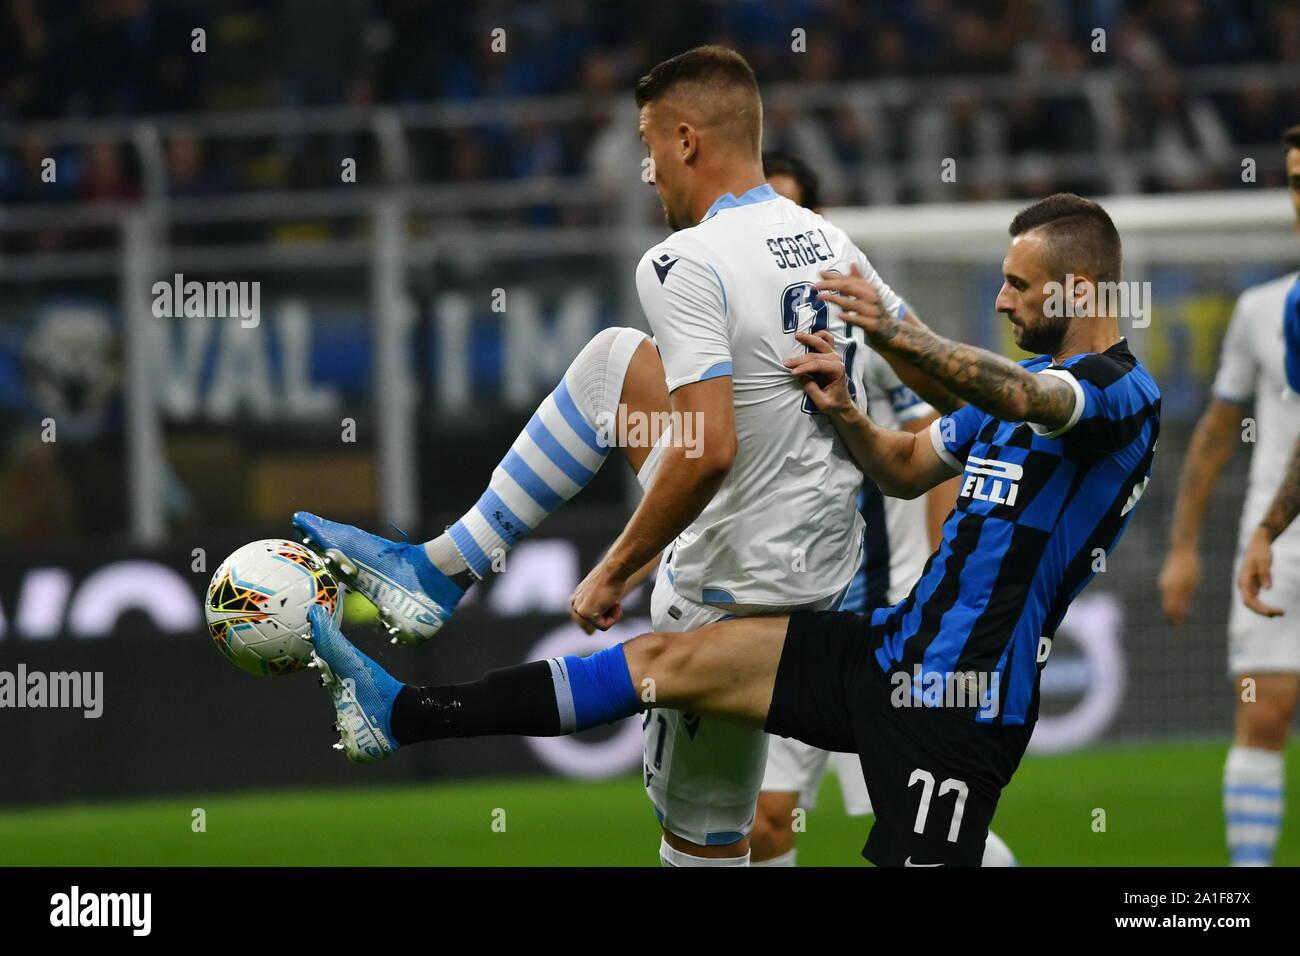 SERGEJ MILINKOVIC SAVIC LAZIO AND MARCELO BROZOVIC INTER during Inter Vs  Lazio , Milano, Italy, 25 Sep 2019, Soccer Italian Soccer Serie A Men  Champi Stock Photo - Alamy